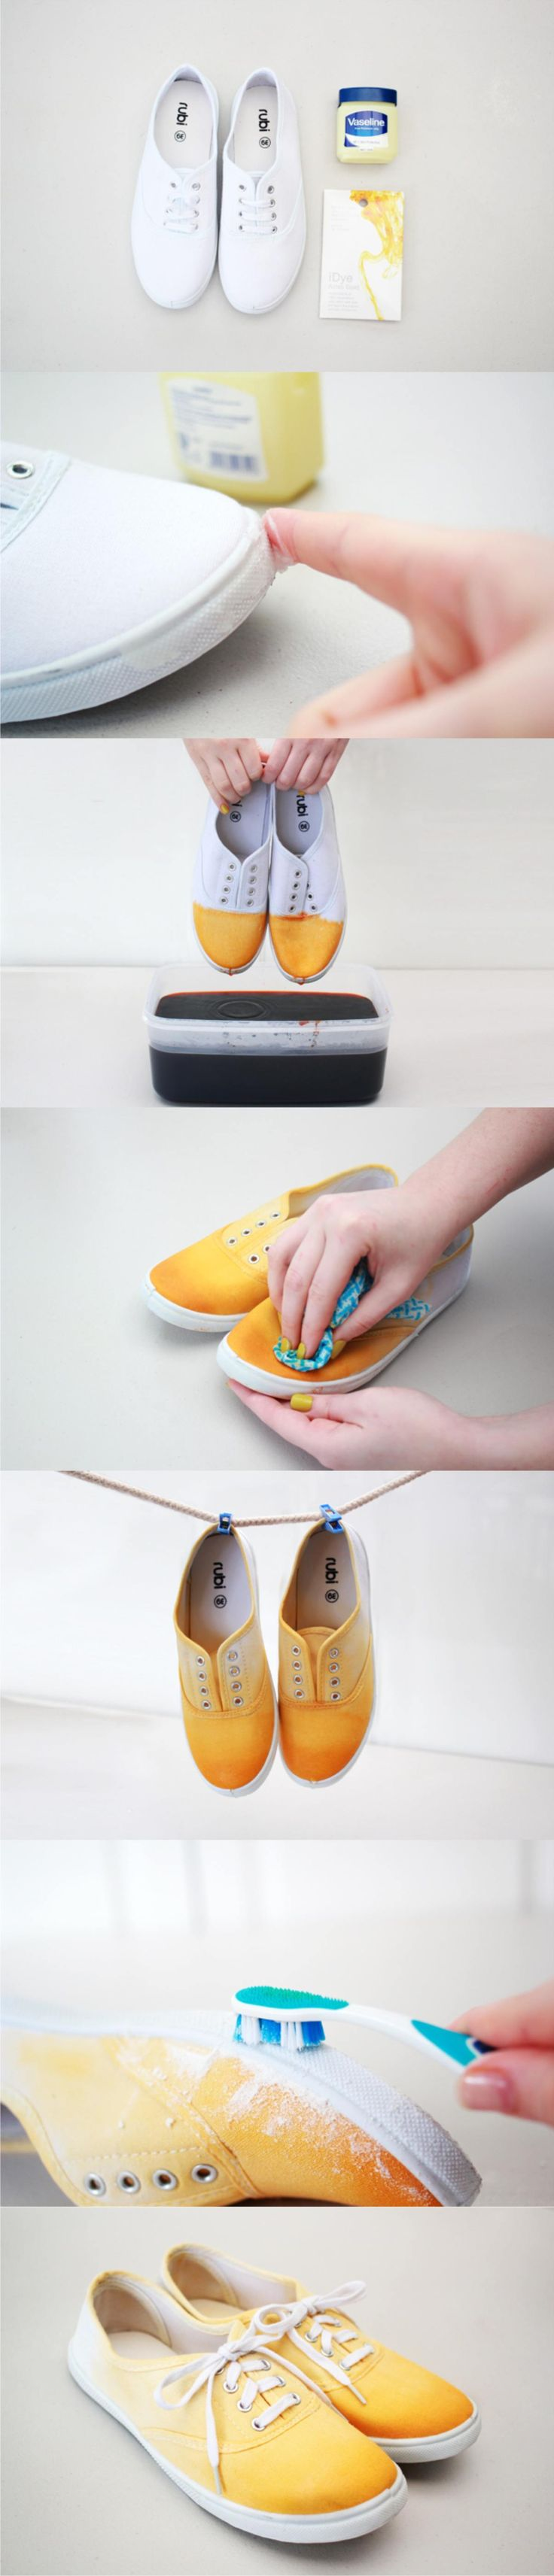 tie dye shoes instructions